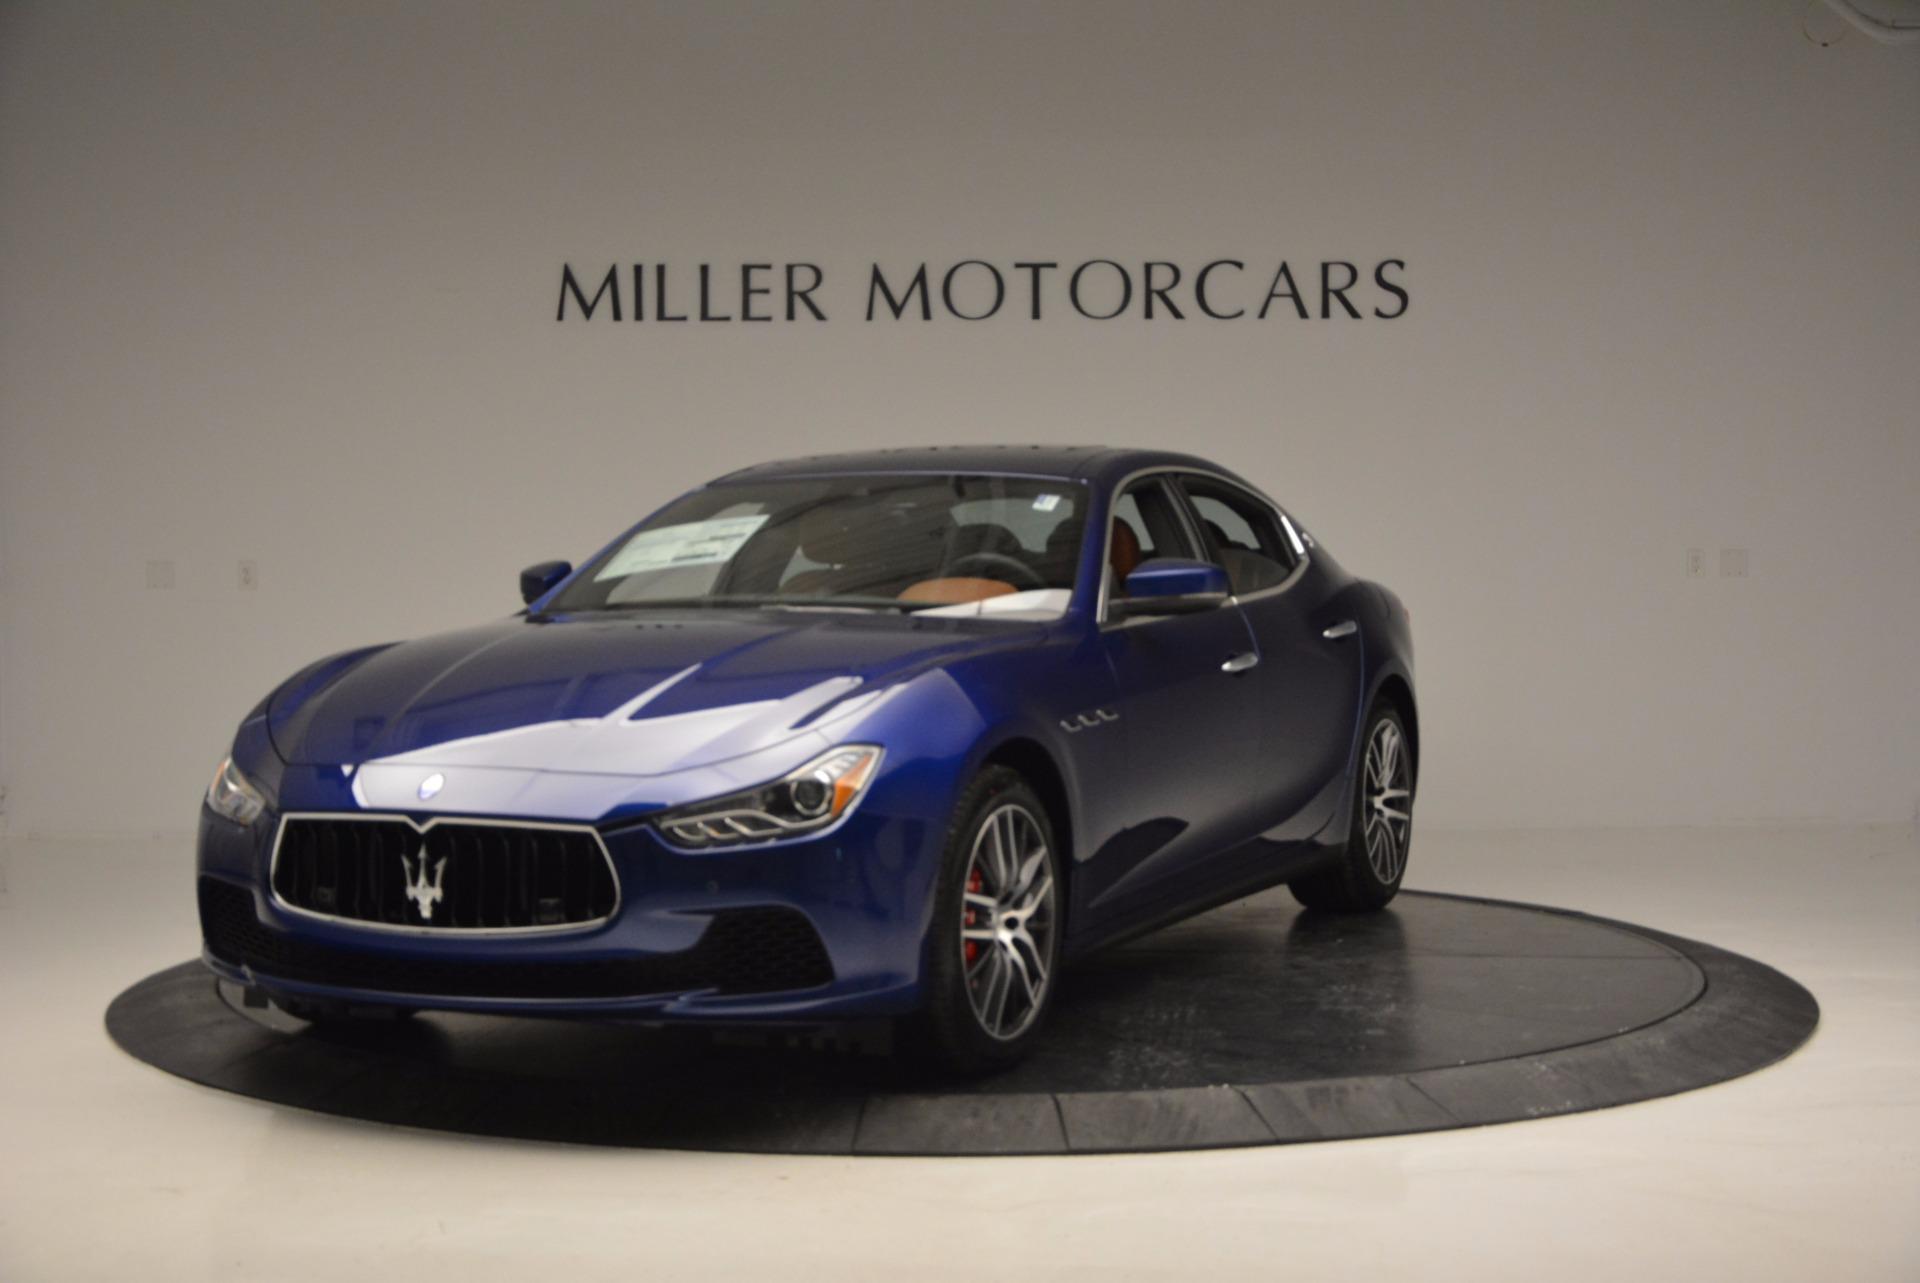 New 2017 Maserati Ghibli S Q4 For Sale In Greenwich, CT 712_main